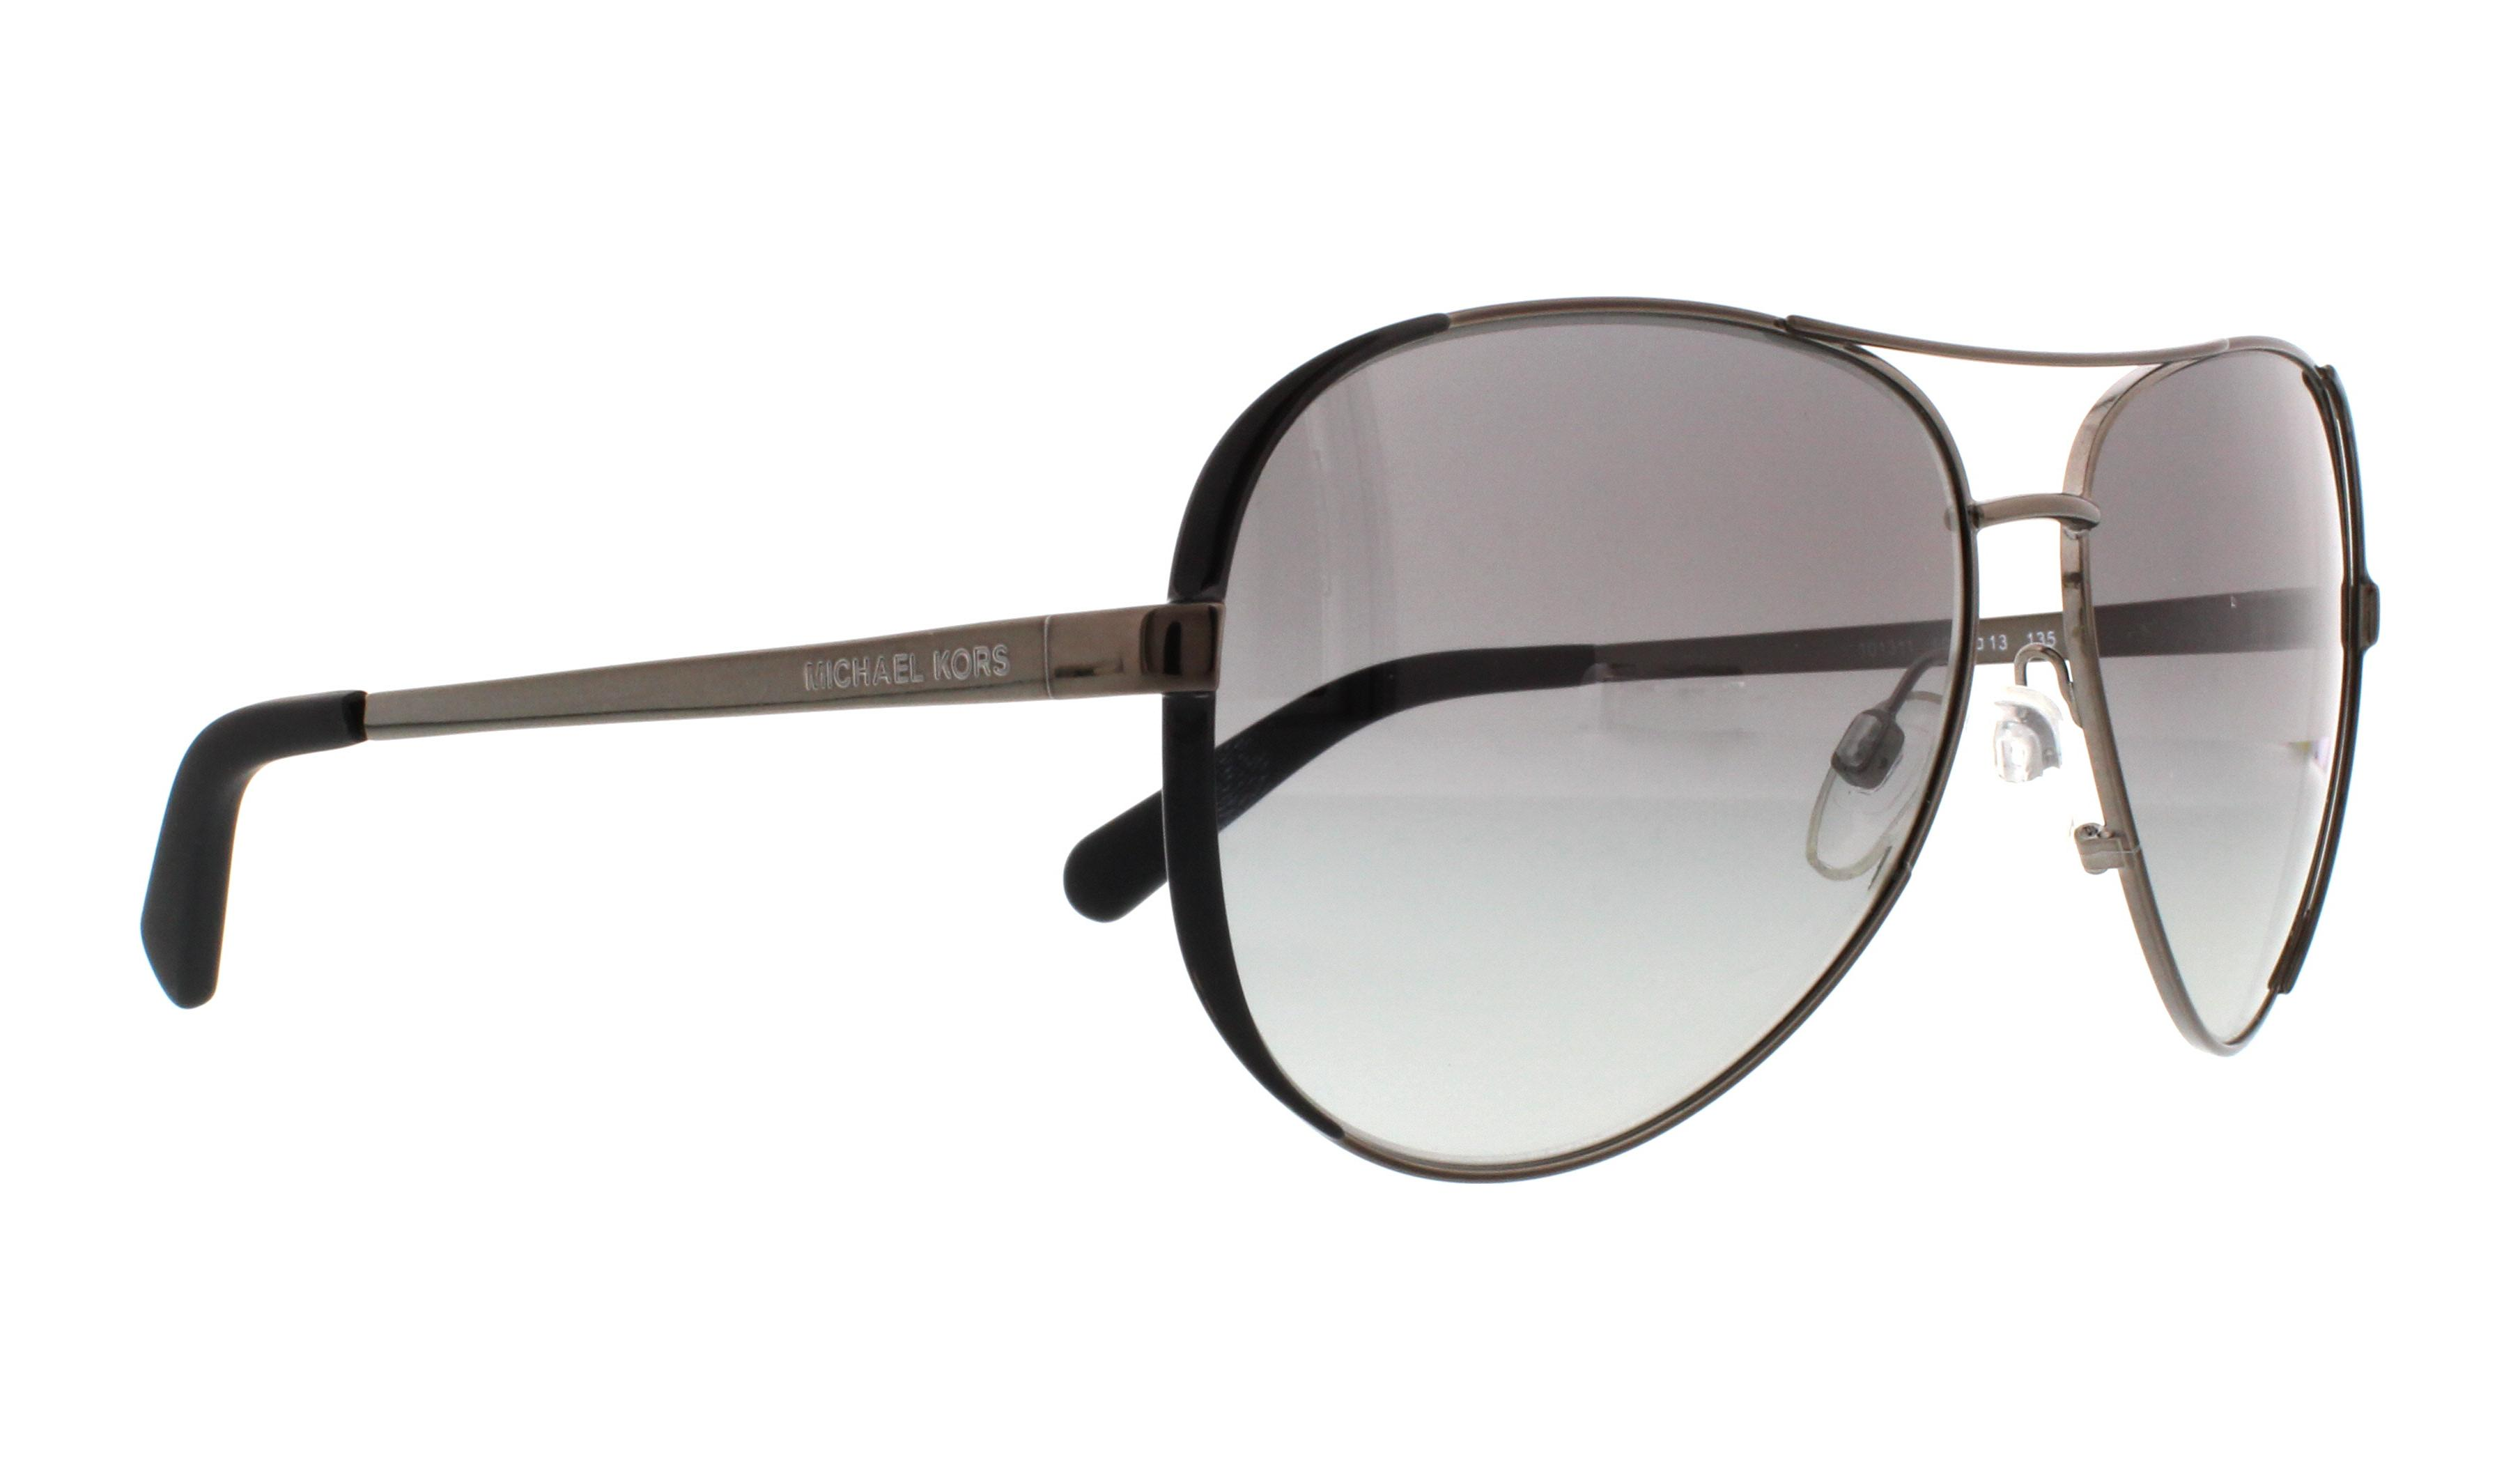 Michael Kors Chelsea Sonnenbrille Gunmetal 101311 59mm CFzUn8QA